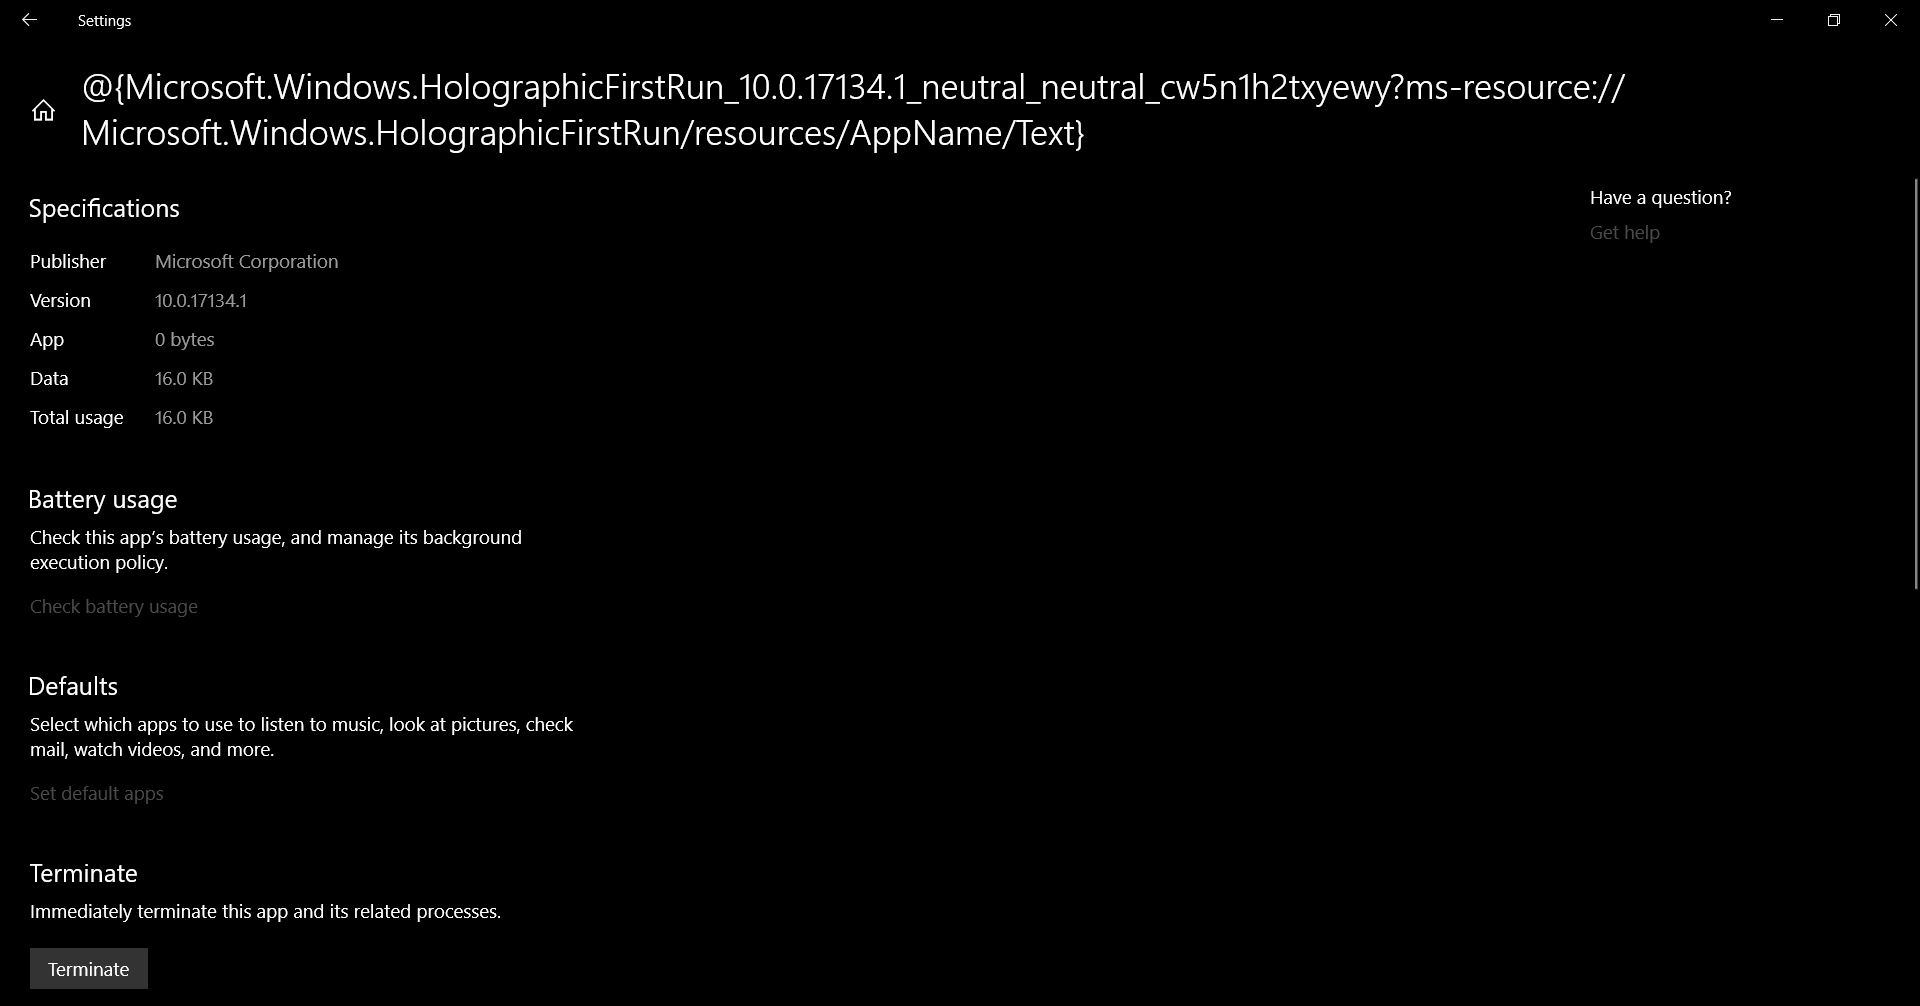 1809 Menu i have an unkonwn shortcut at my start menu - microsoft